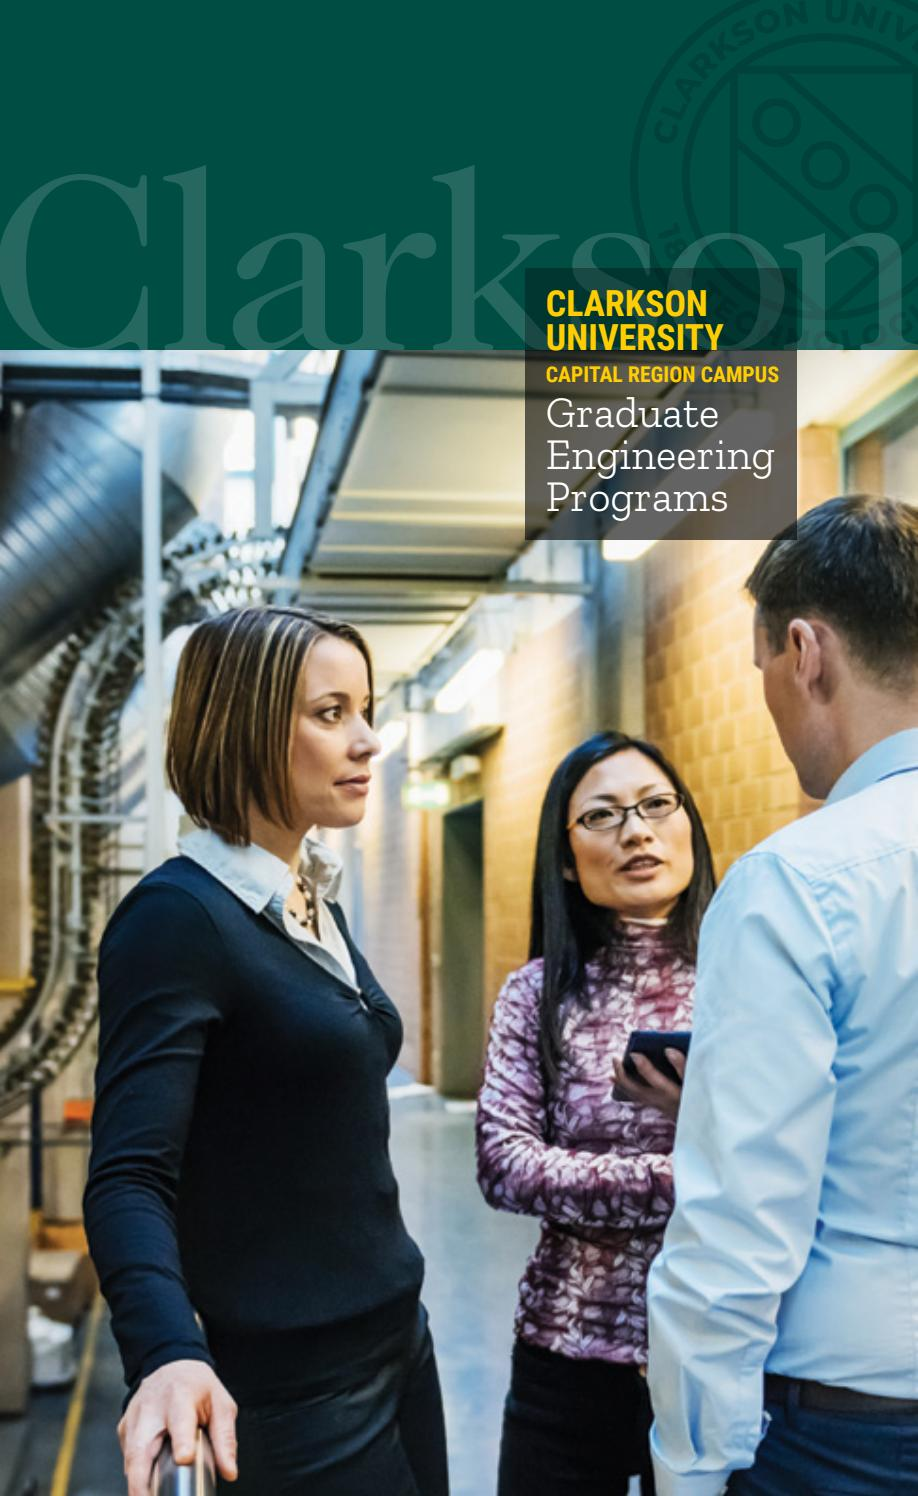 Clarkson University Capital Region Campus Crc Graduate Engineering Programs By Clarkson University Graduate School Issuu